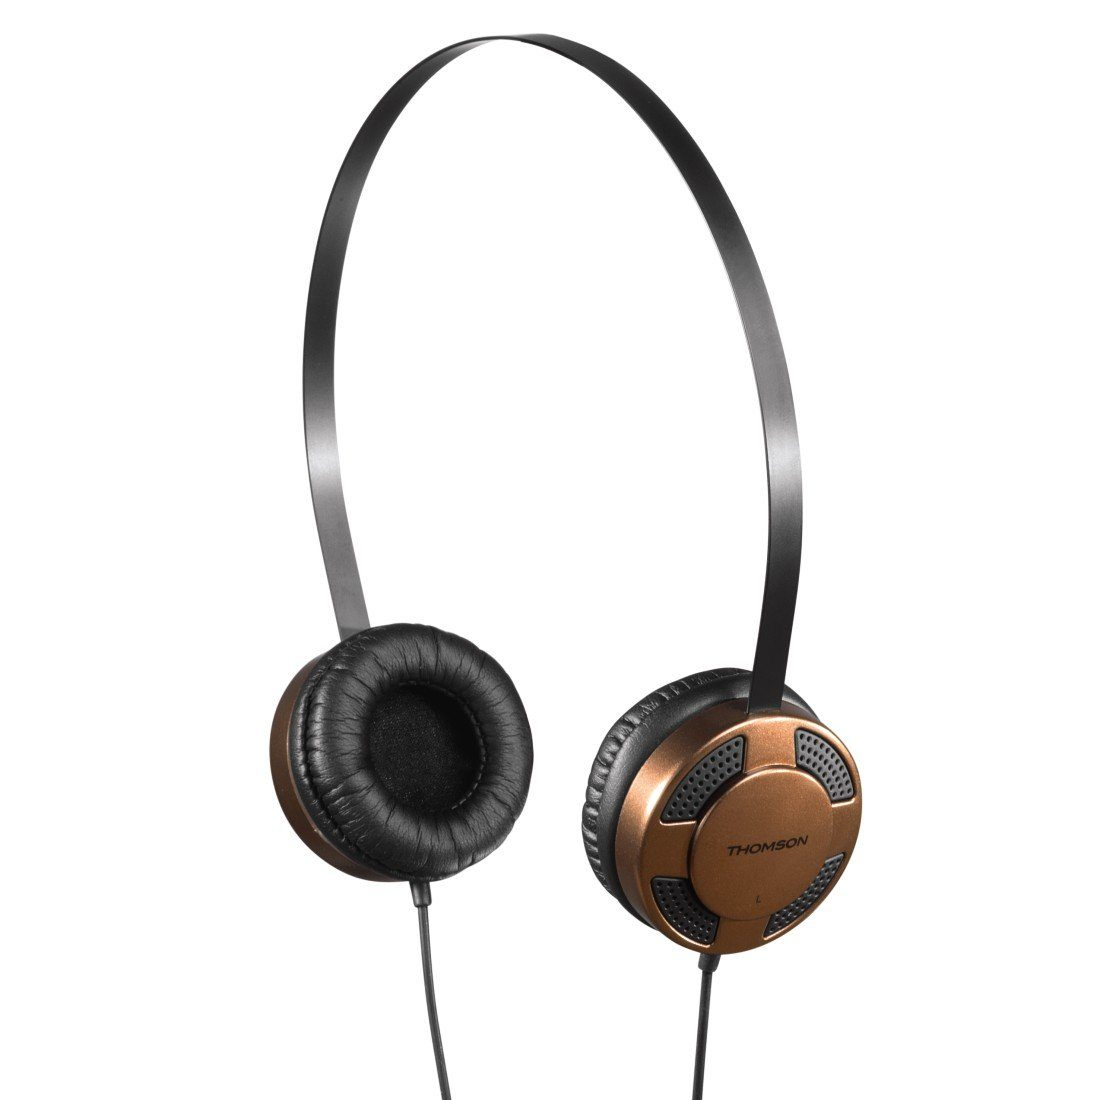 Thomson HED1123BR/BK Stereo-Kopfhörer, Braun/Schwarz